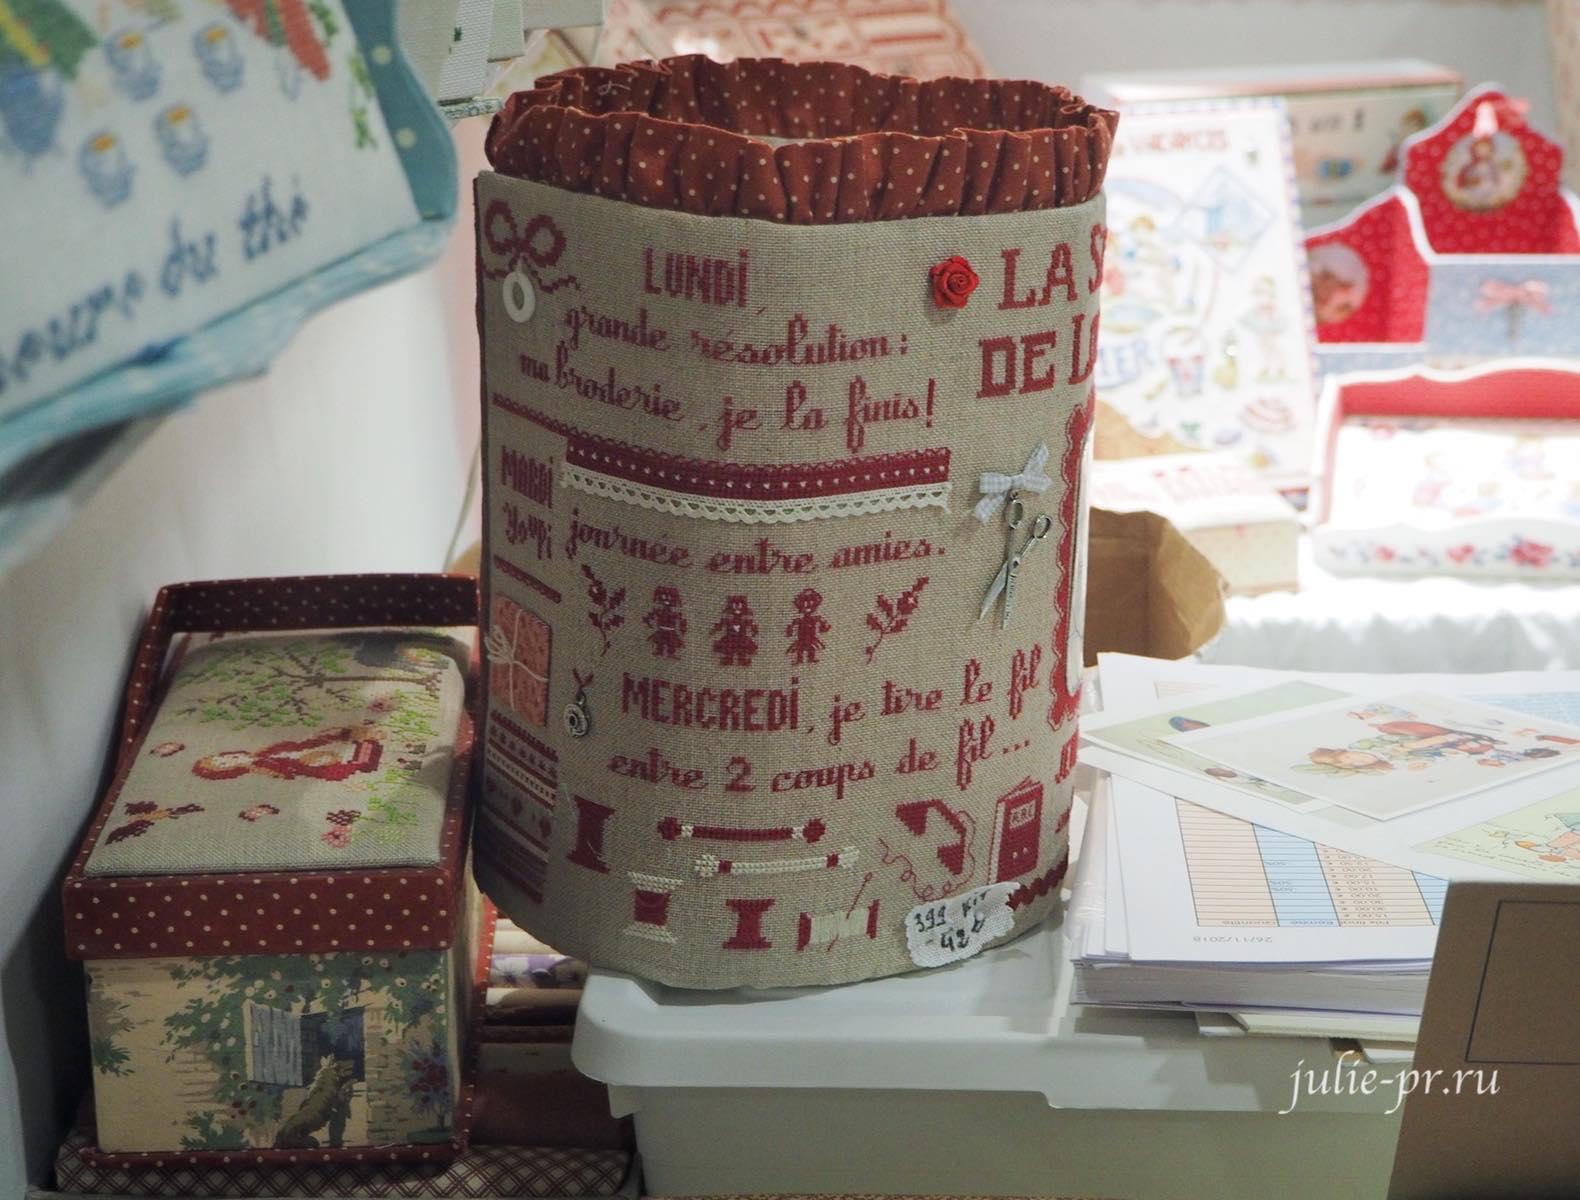 вышивка крестом, Des histoires a broder, рукодельный салон Creations & Savoir-Faire 2019, рукодельная выставка, Париж